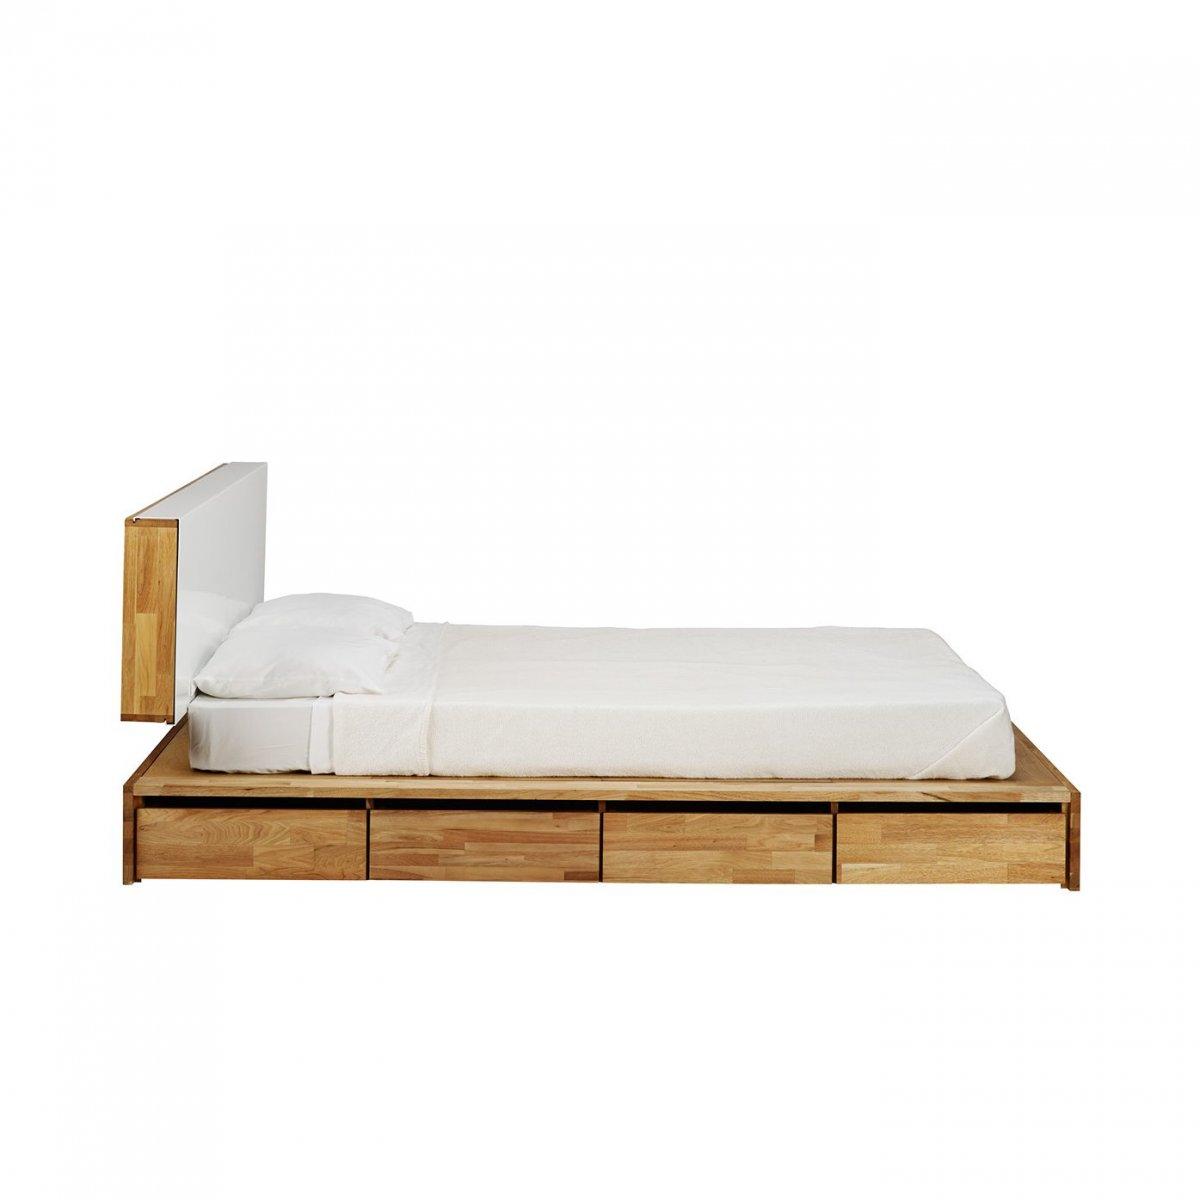 LAXseries Storage Bed.